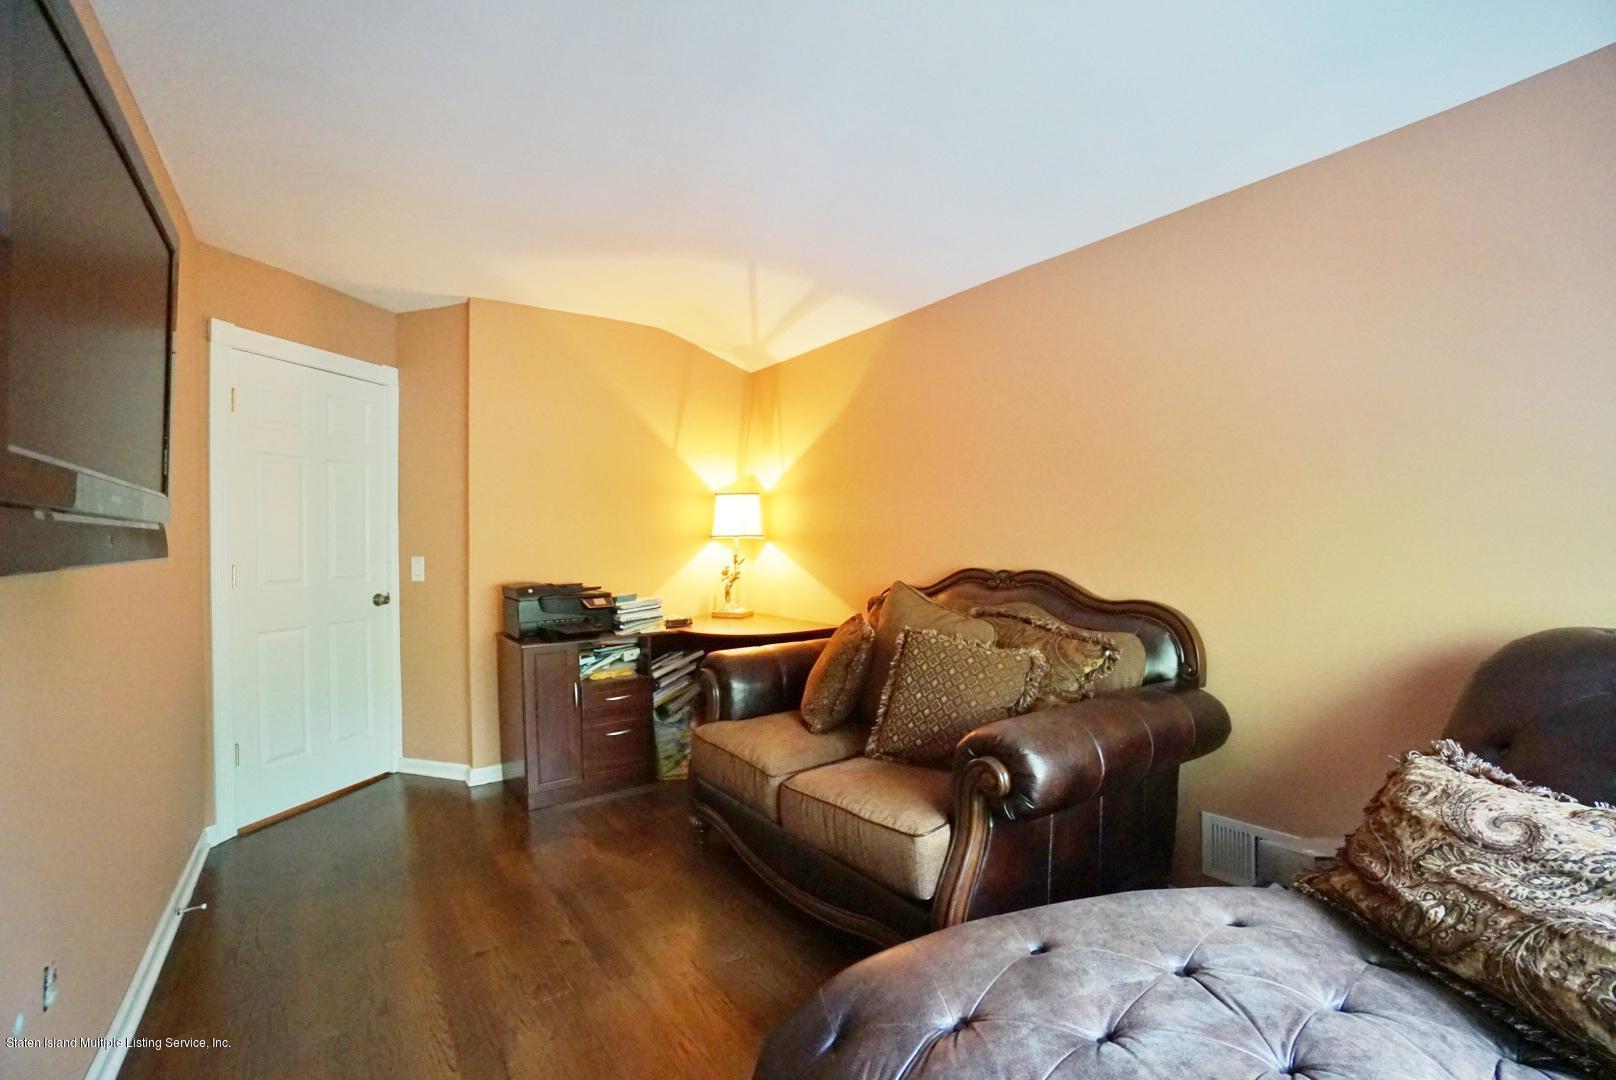 Single Family - Attached 30 Halpin Avenue  Staten Island, NY 10312, MLS-1132039-29